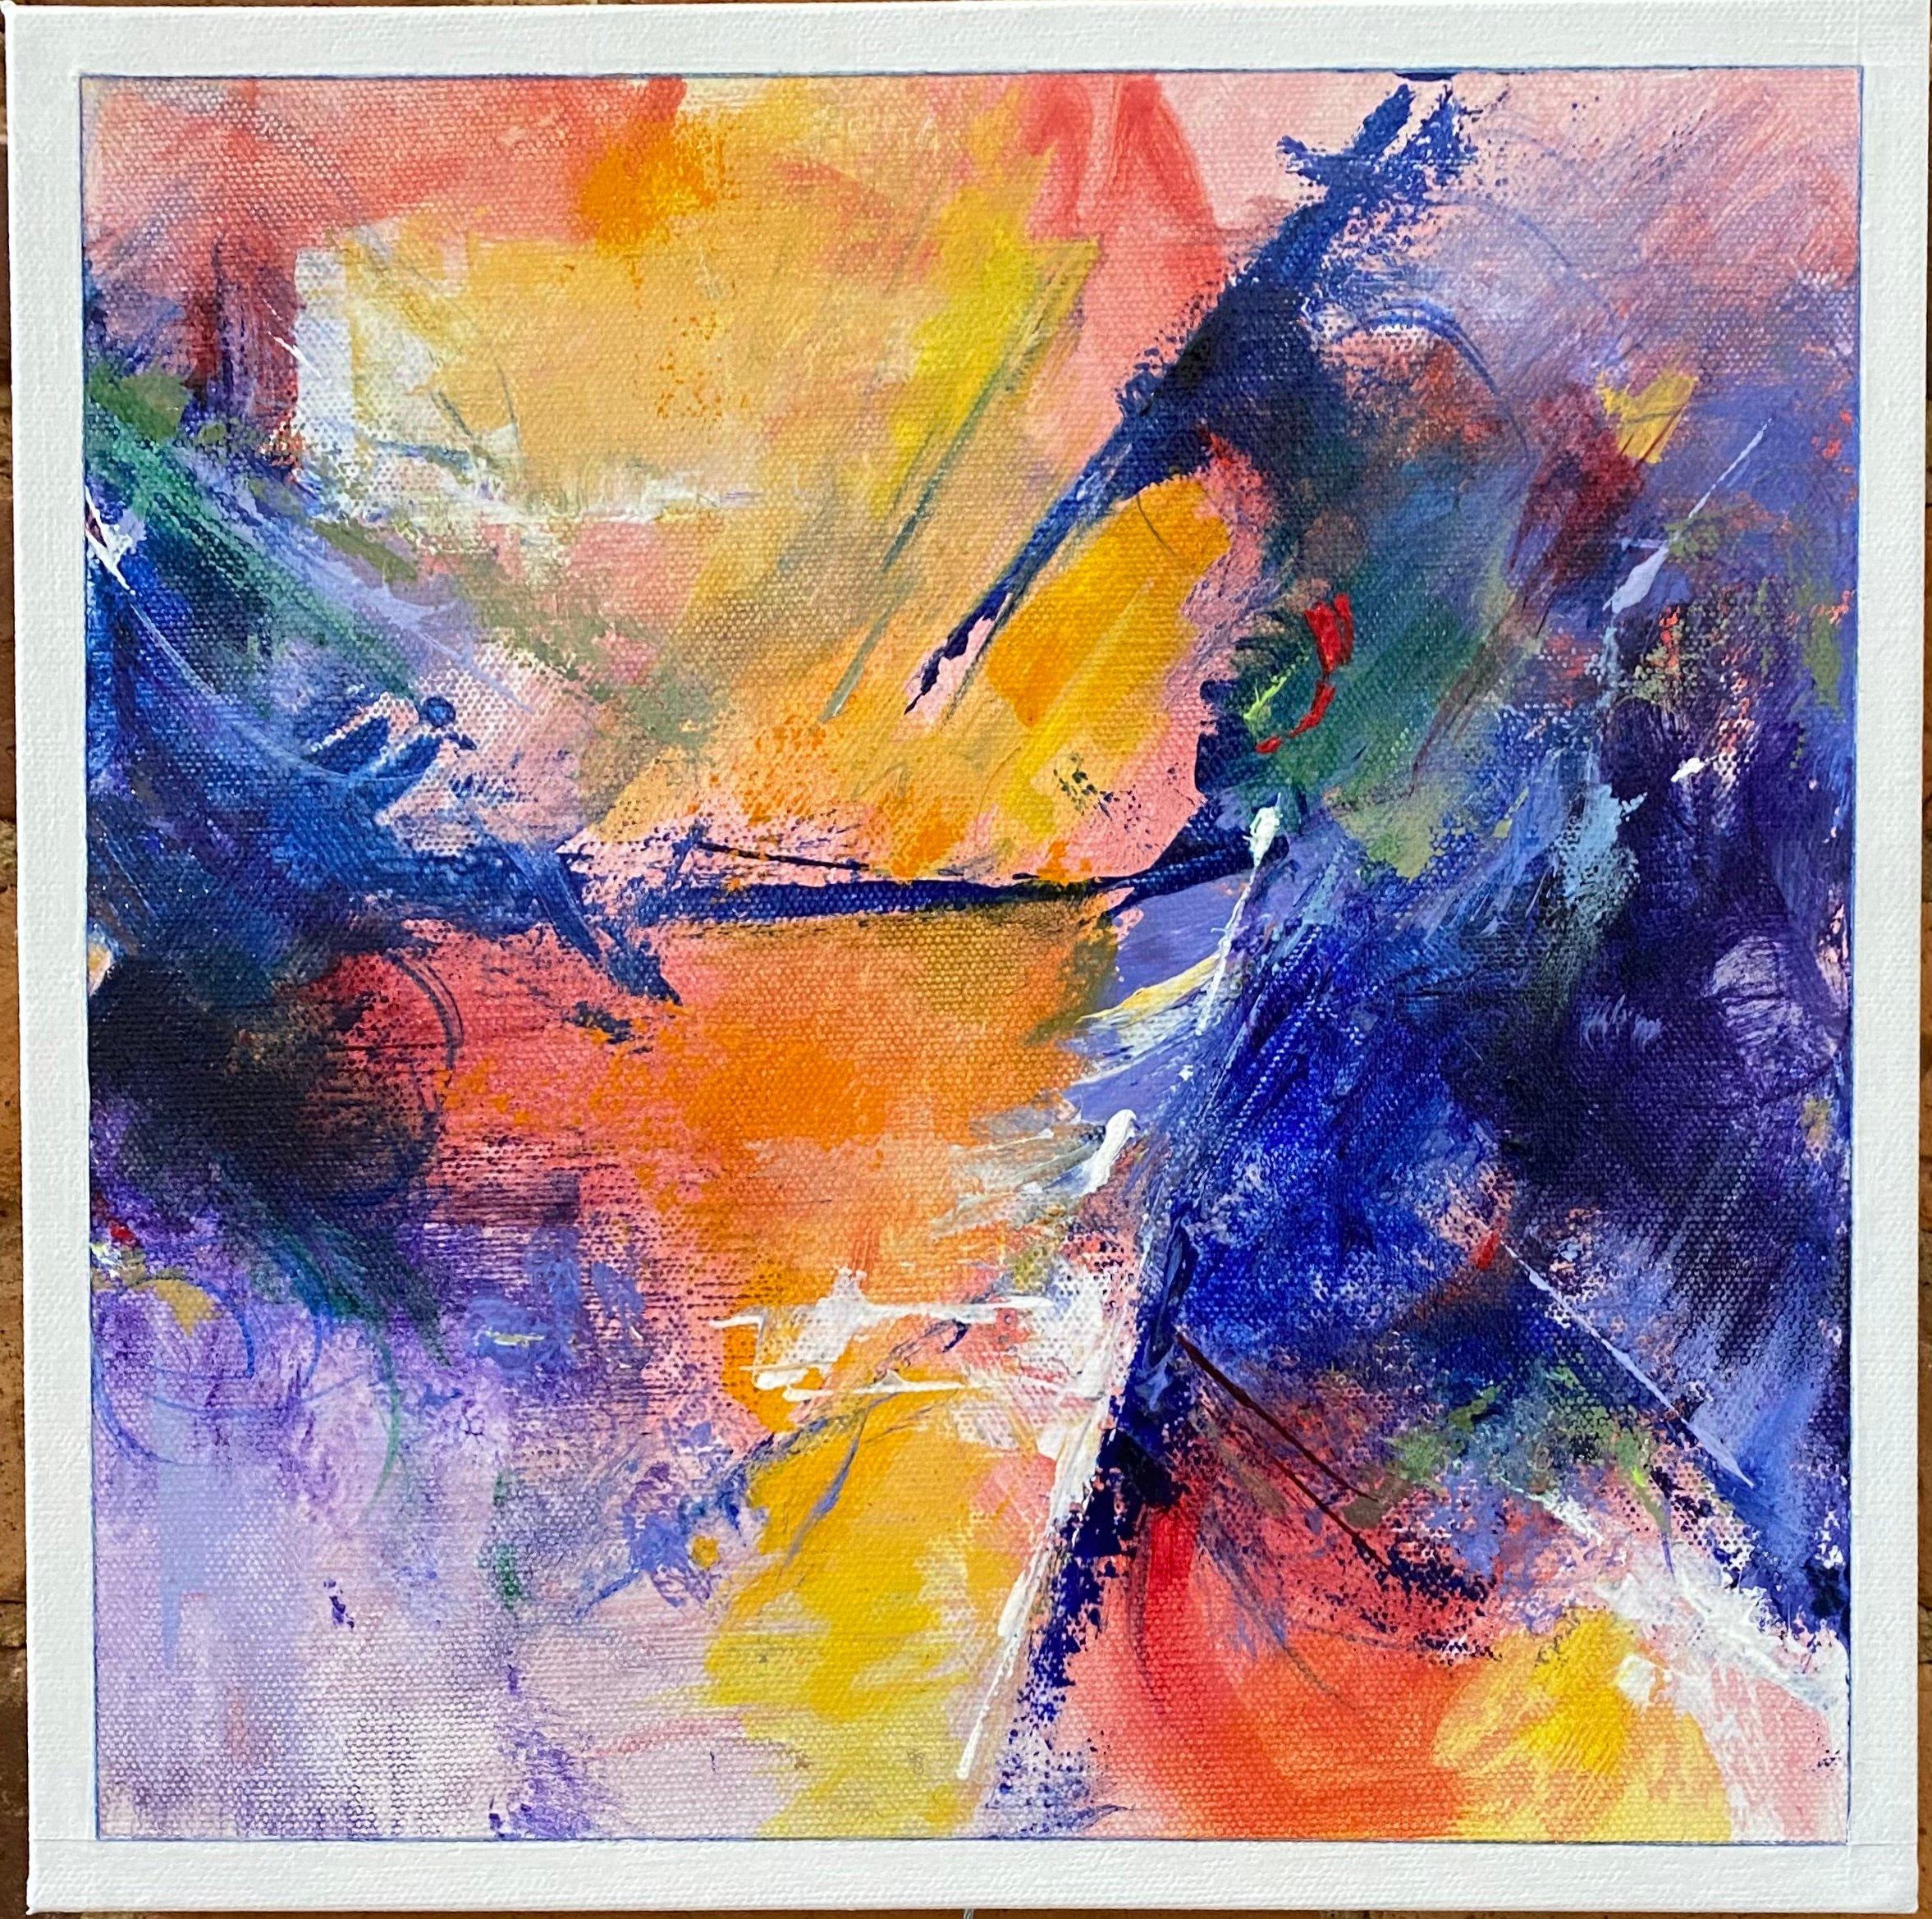 Abstract Acrylic 12'x12' $100.